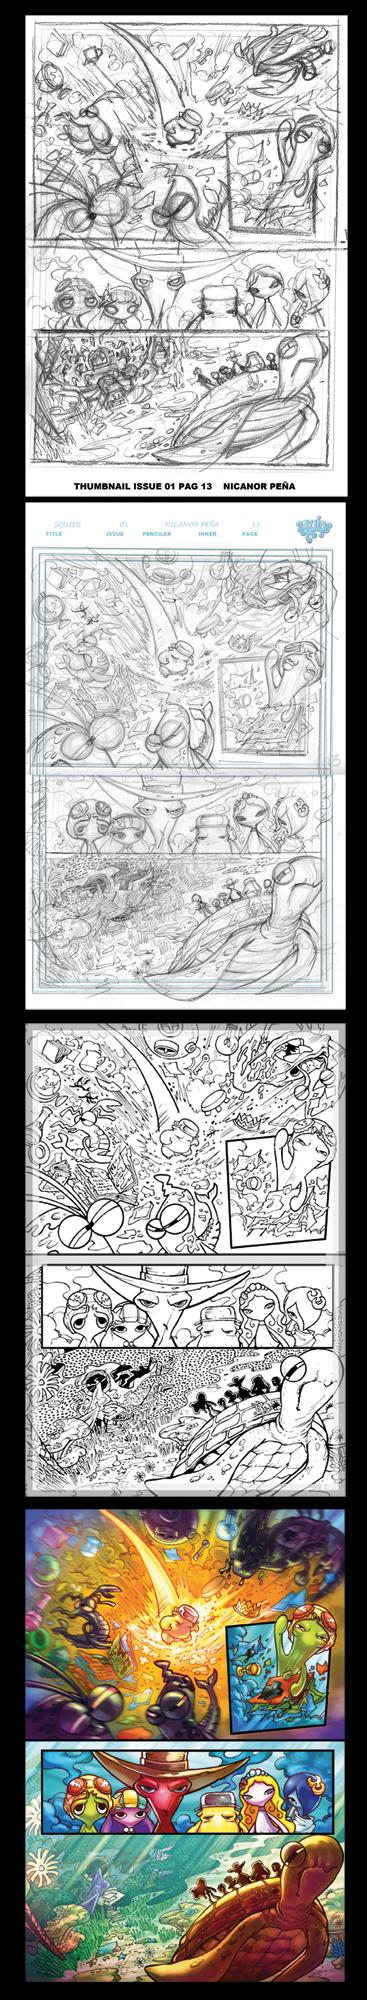 Squids comic process 01 by pecart